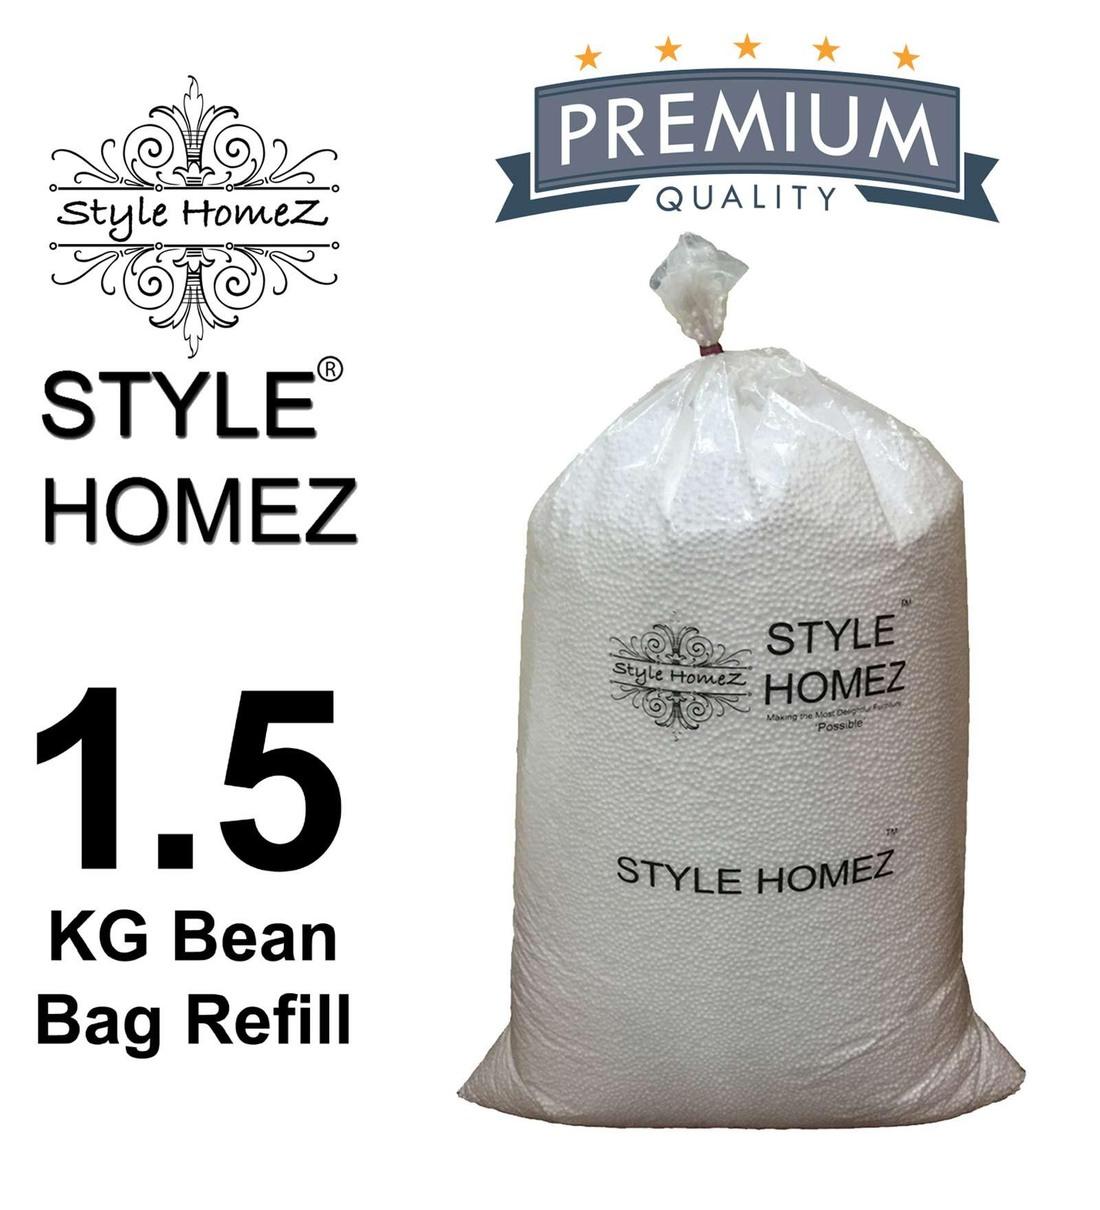 Buy 1.5 Kg High Quality Polyurethane Bean Bag Refill Beans by Style Homez Online - Bean Bag